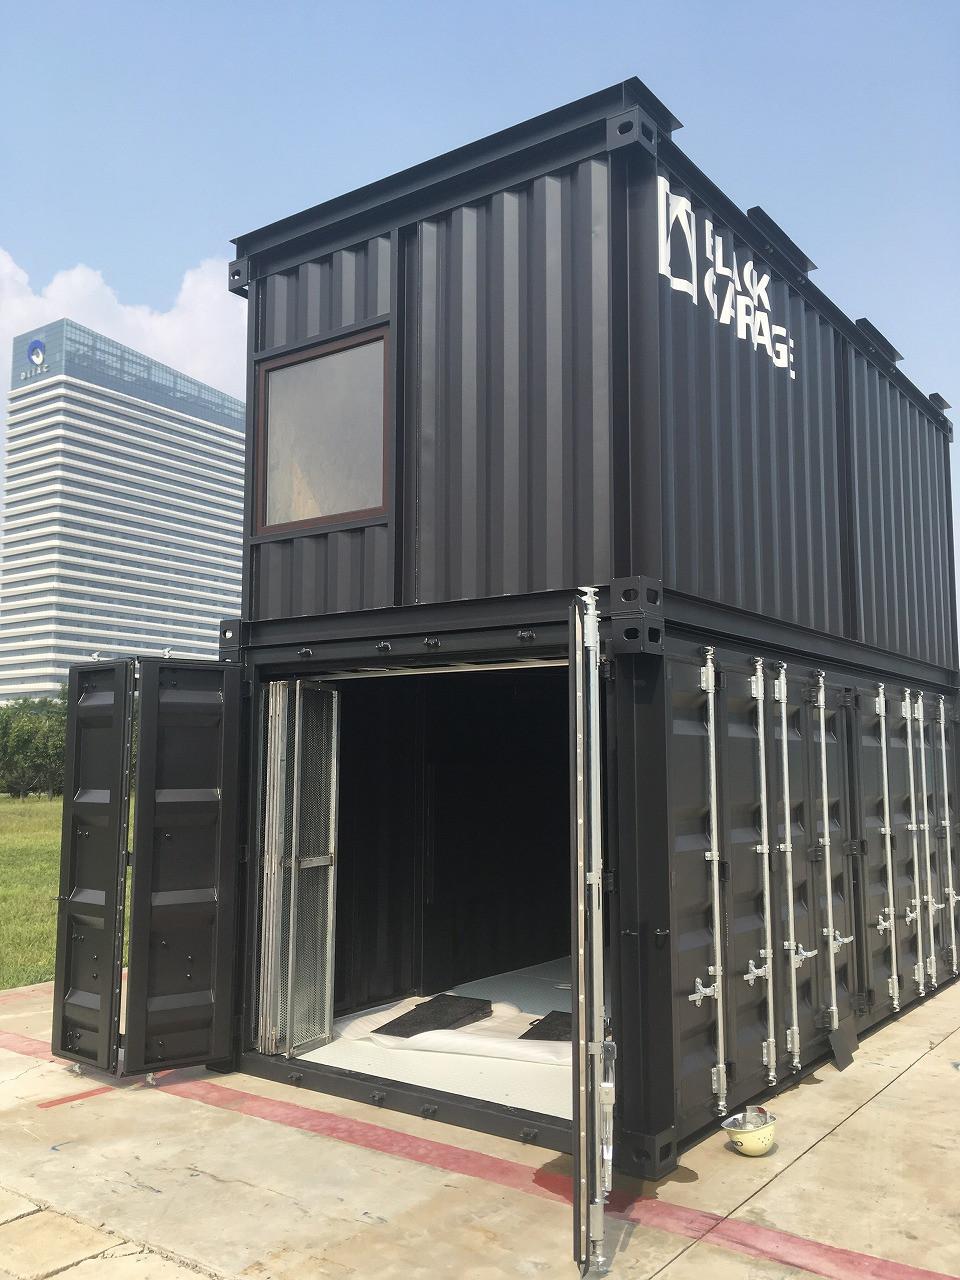 IDMobileのコンテナガレージ・コンテナハウス・ガレージハウス